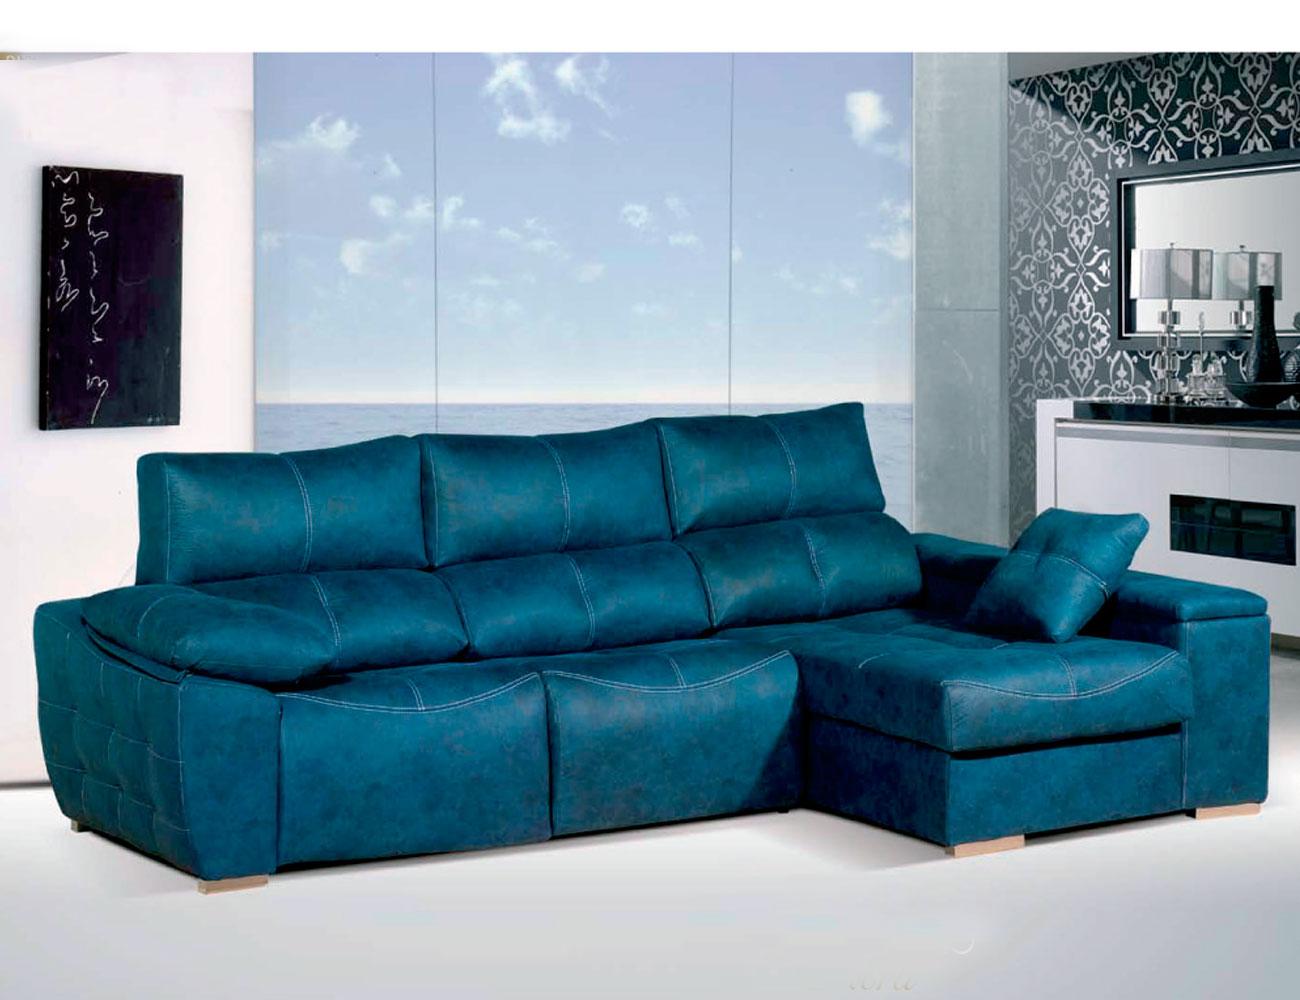 Sofa chaiselongue relax 2 motores anti manchas turquesa12